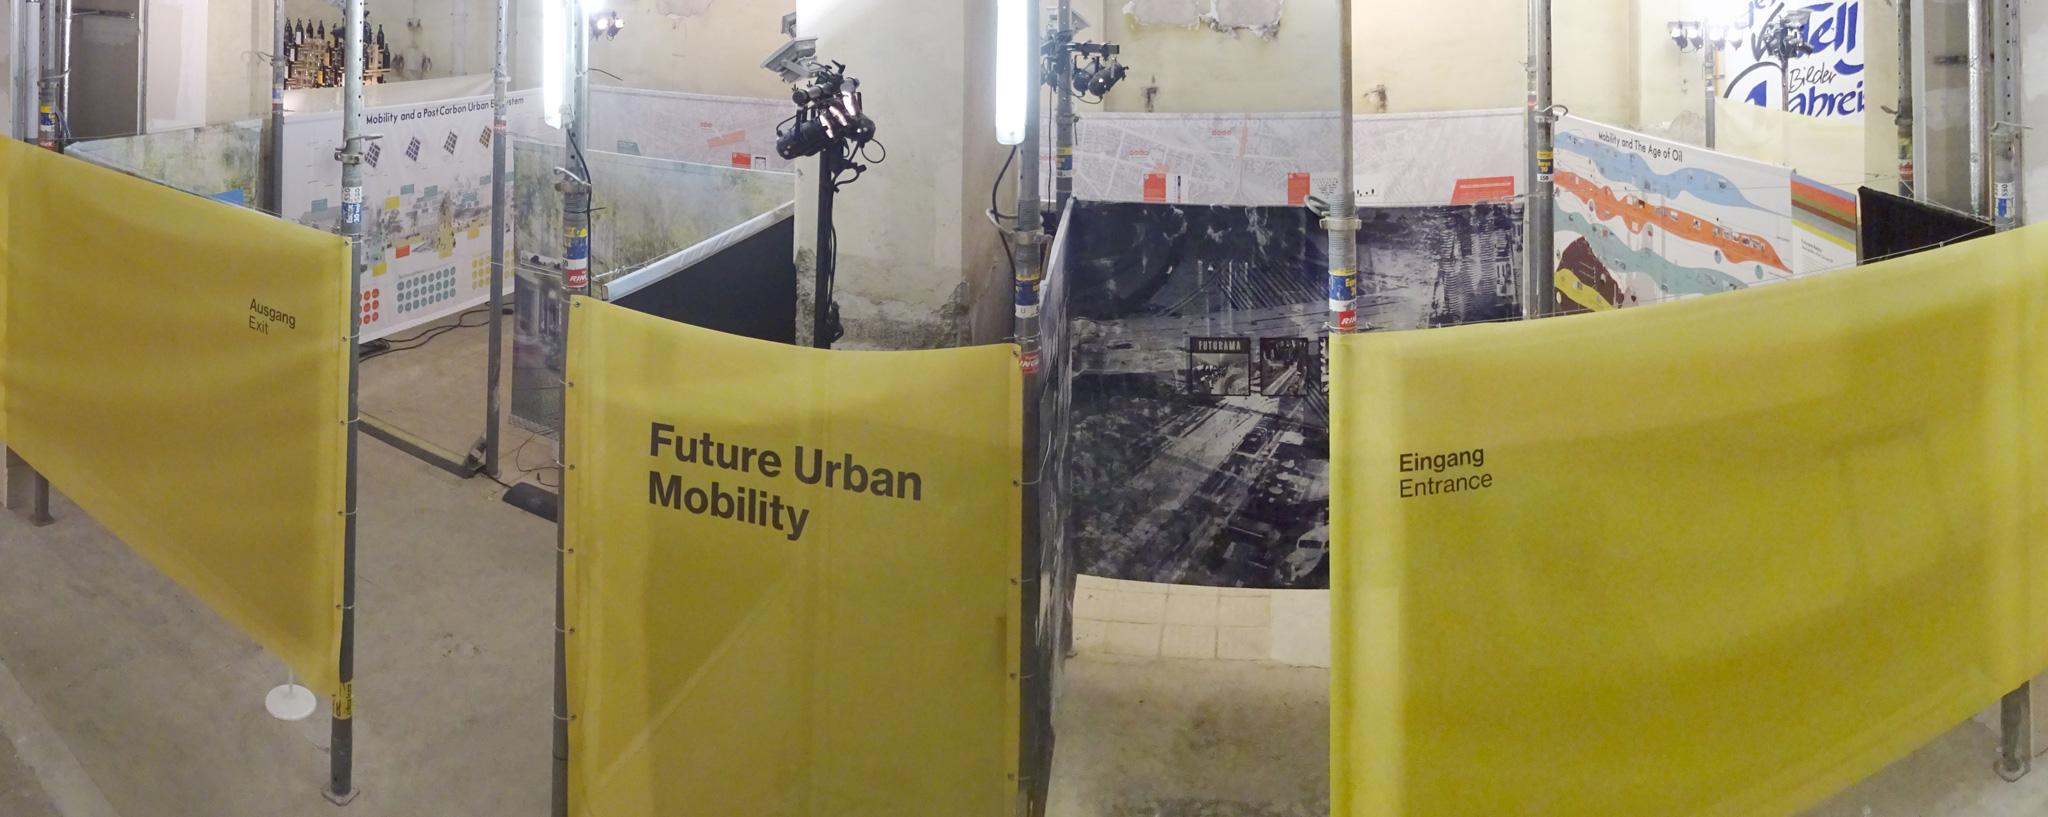 SmarterThanCar_2015_r+d-postcabonr-Vienna_exhibit-pan